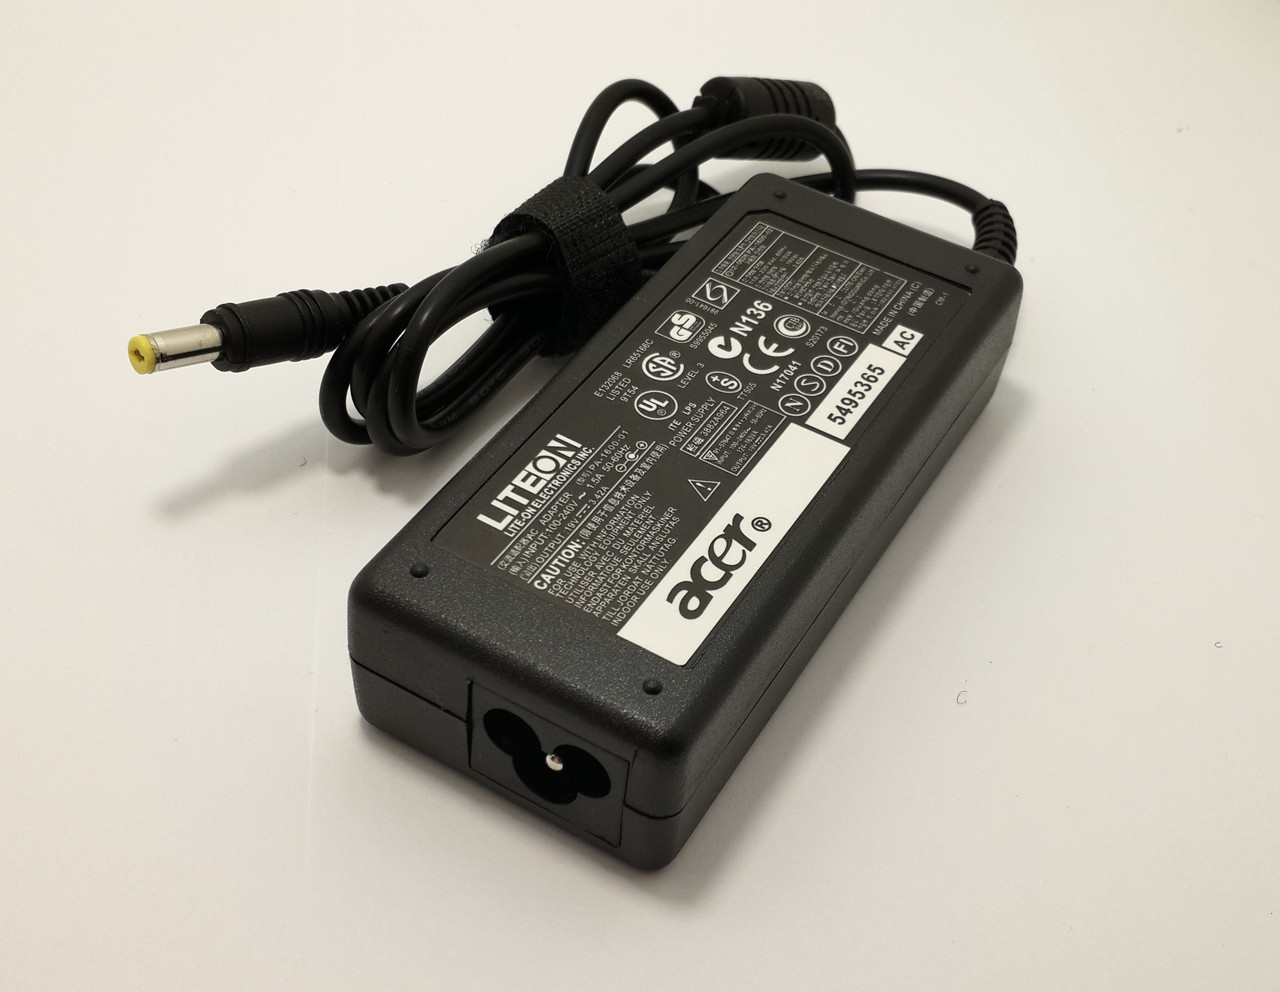 Блок питания для ноутбука ACER eMachines D728 19V 3.42A 65W